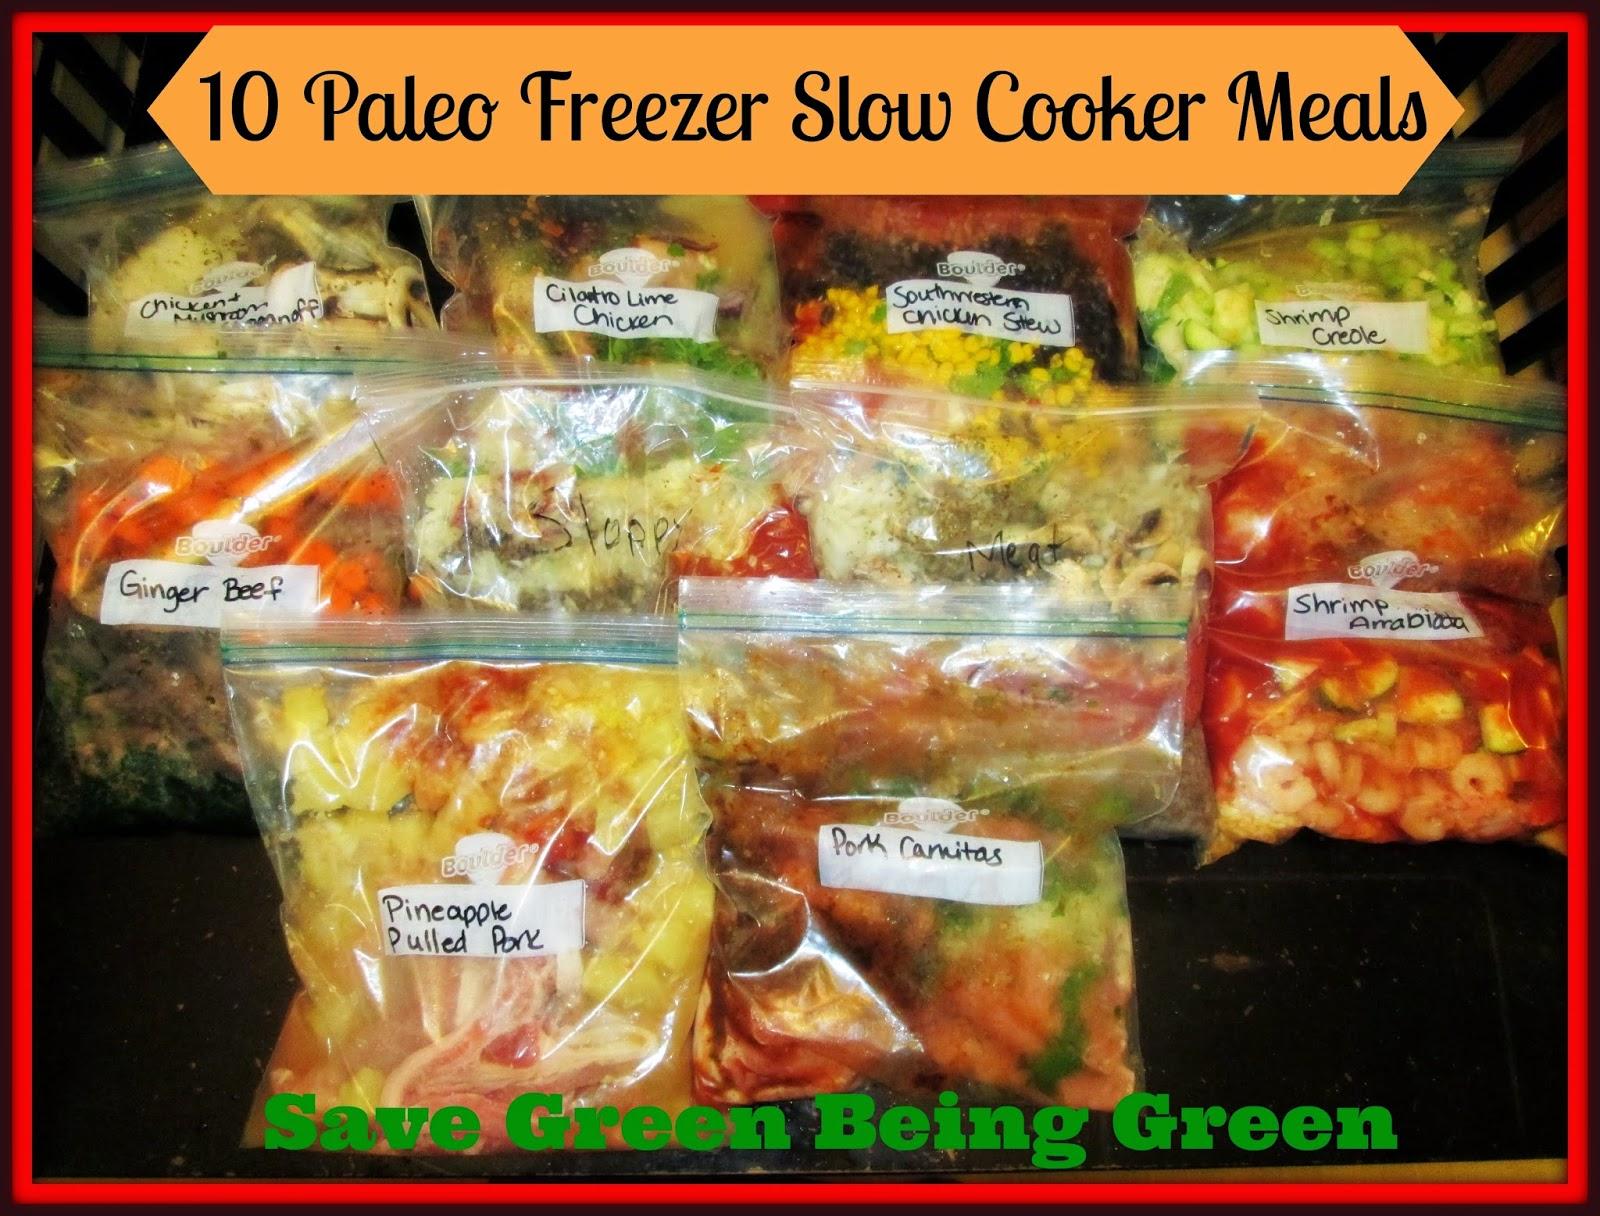 Prepared Paleo Meals